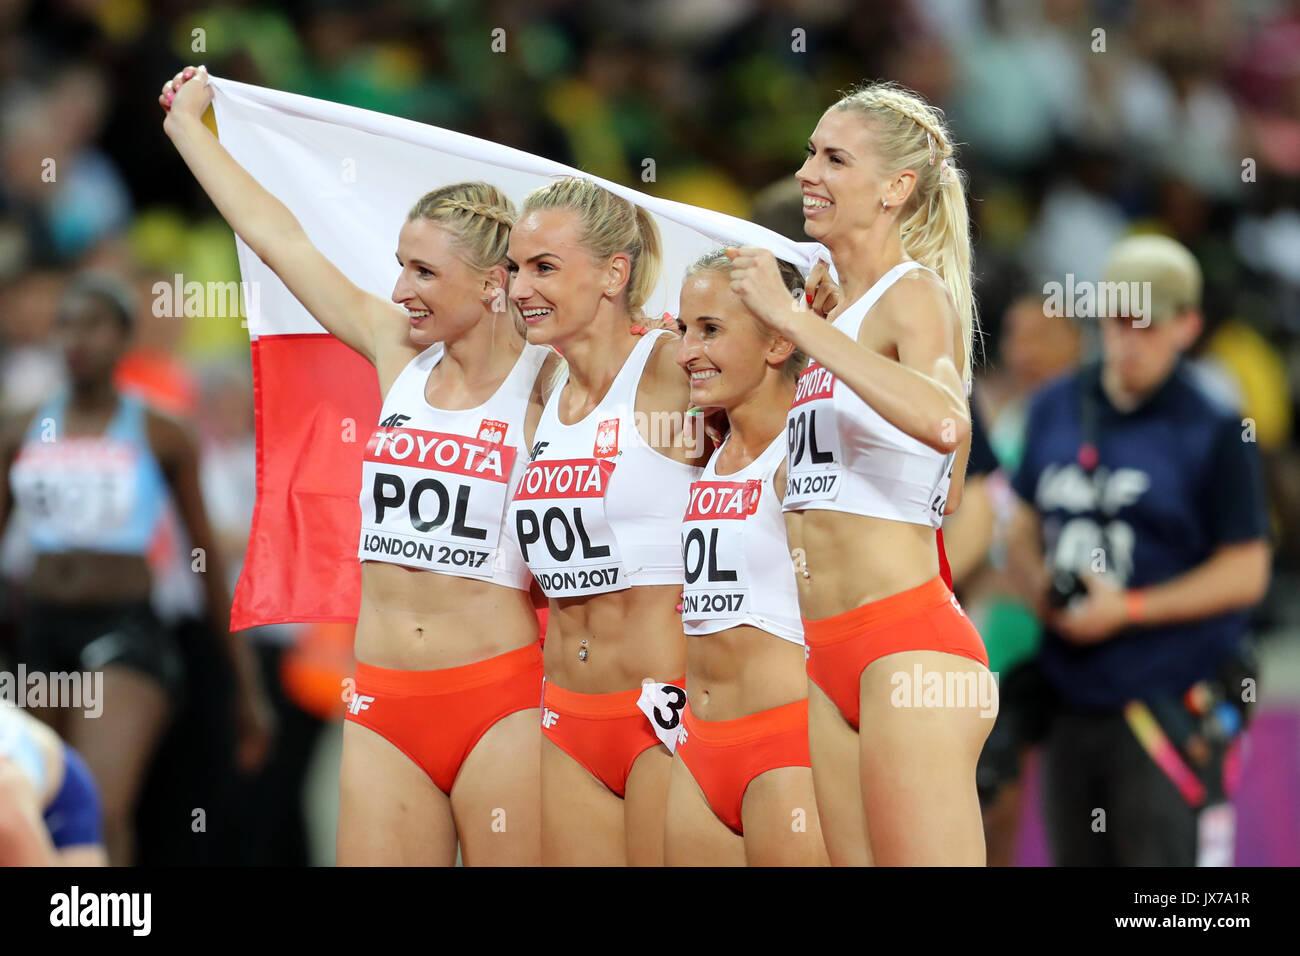 MalgorzataHOLUB, IgaBAUMGART, AleksandraGAWORSKA, JustynaSWIETY (Poland) celebrate Bronze medal in the Women's 4 x 400m Final at the 2017 IAAF World Championships, Queen Elizabeth Olympic Park, Stratford, London, UK - Stock Image